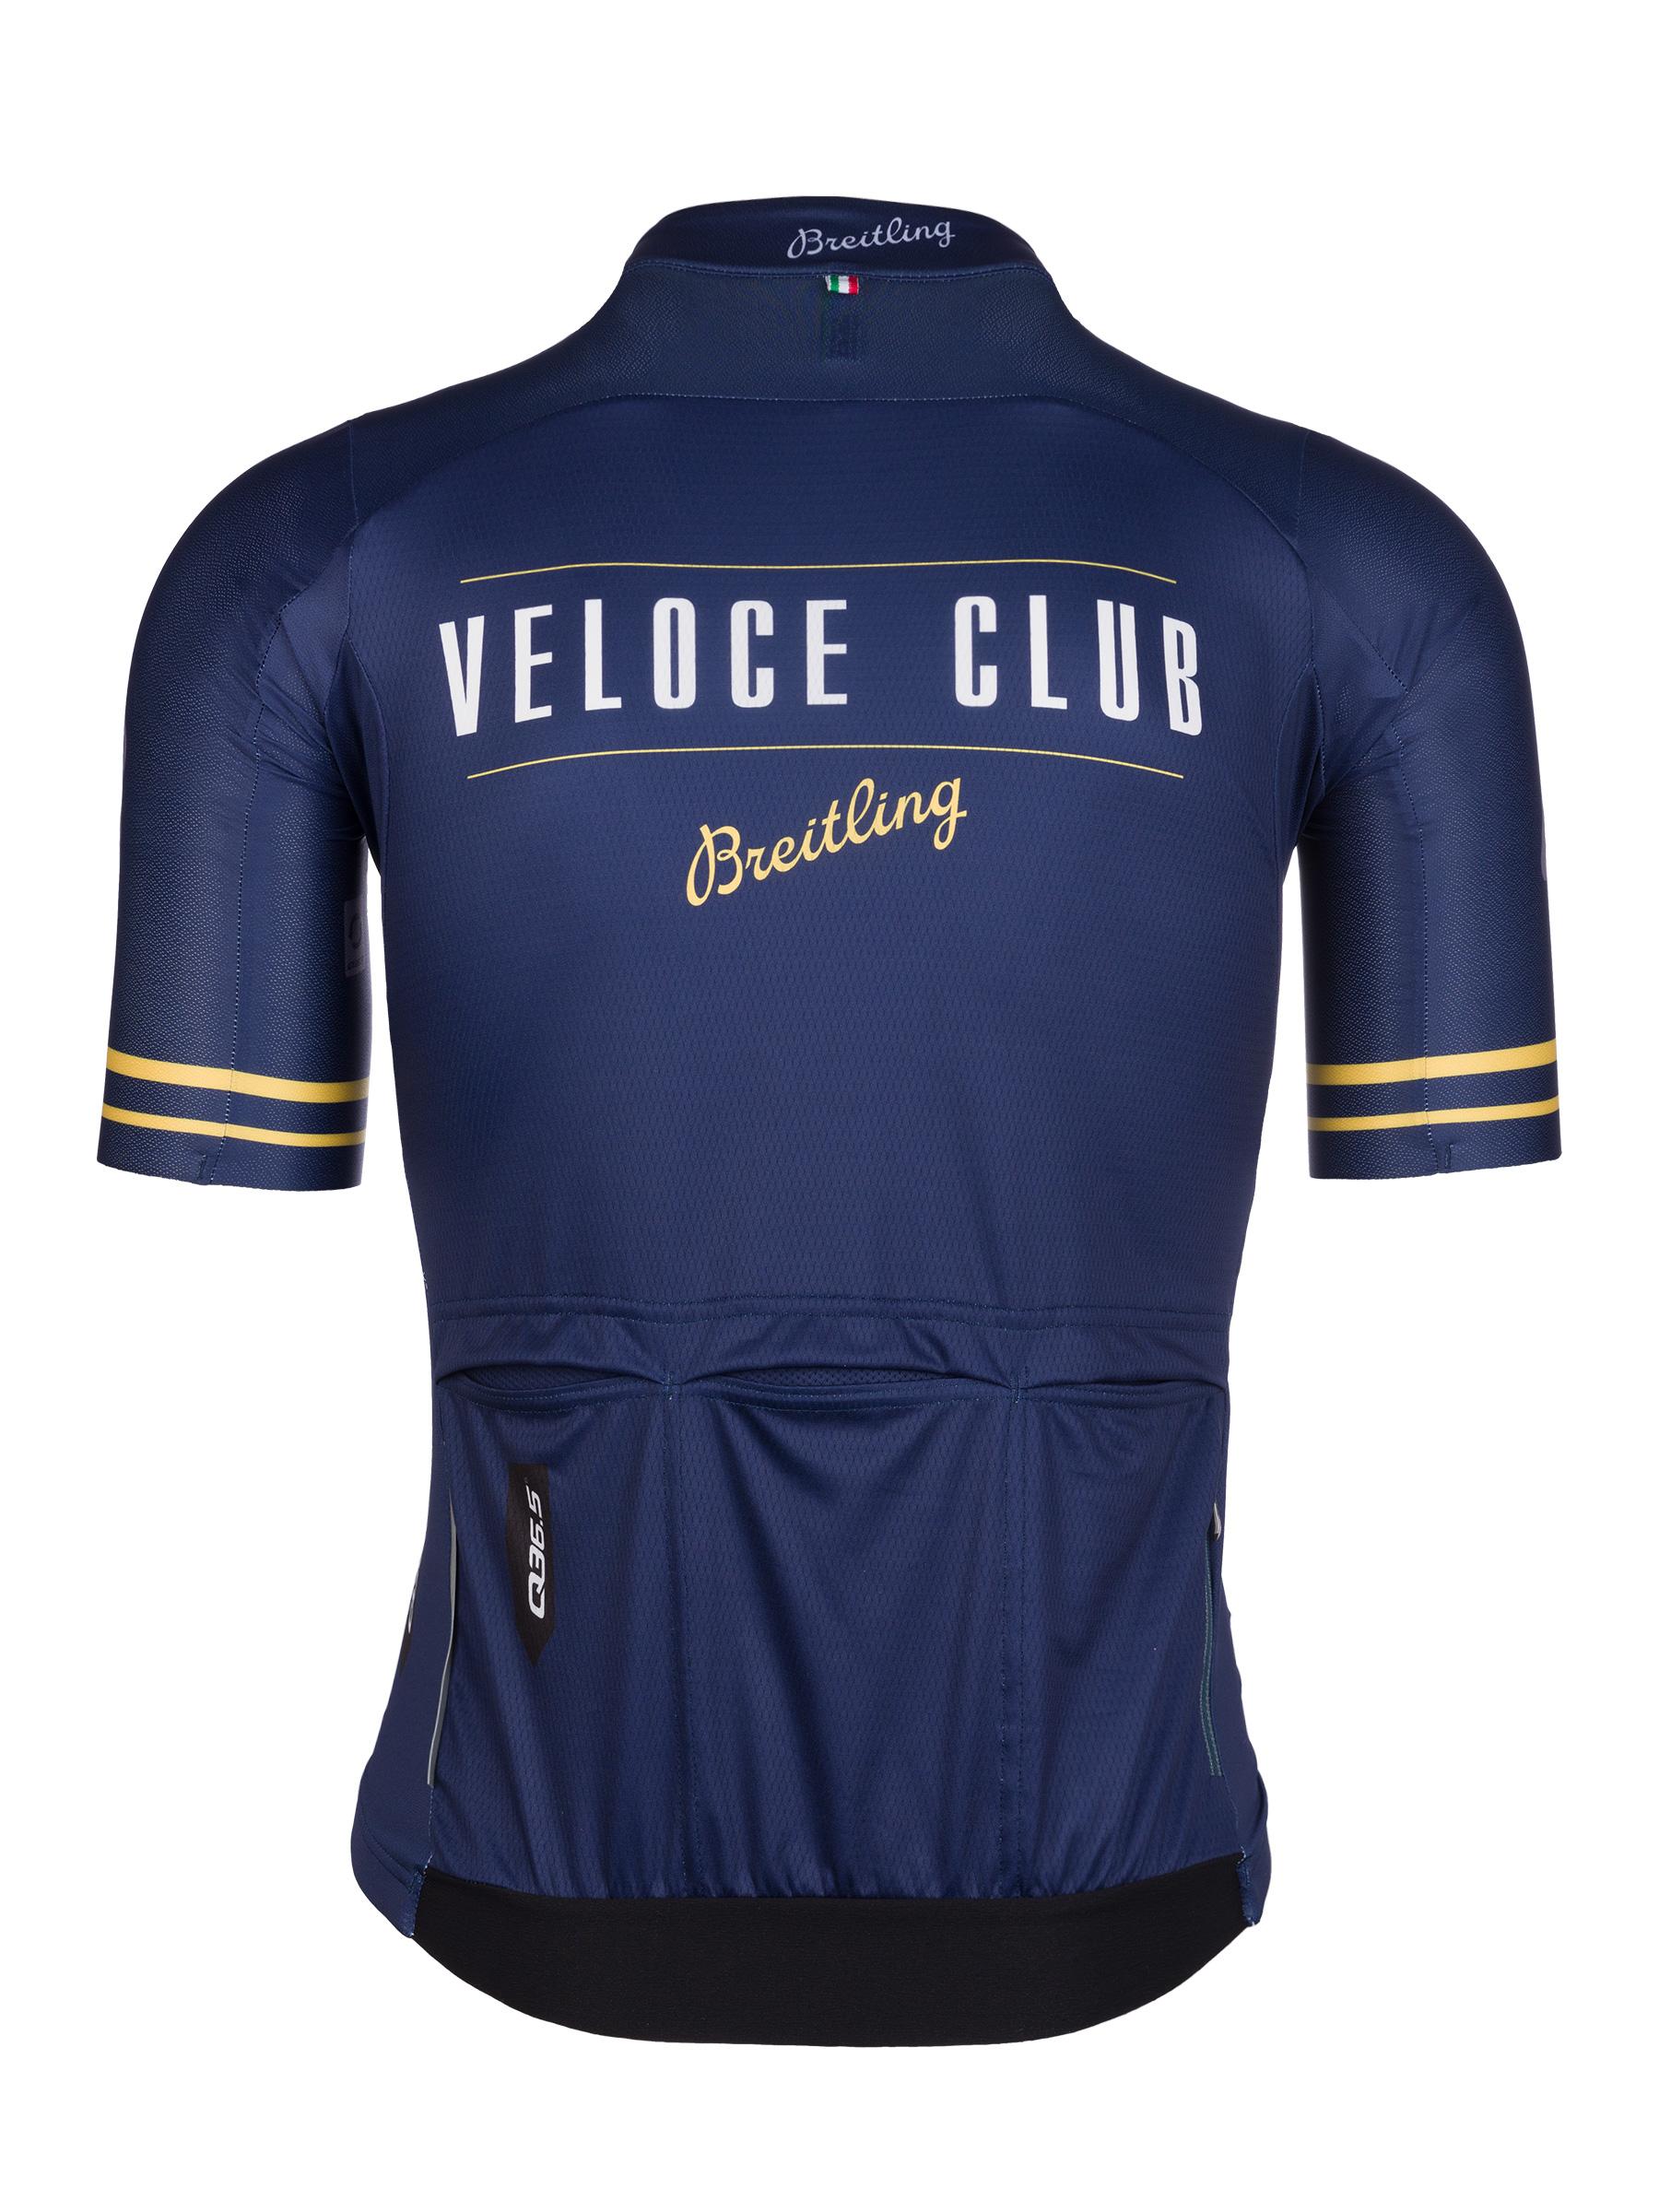 Jersey Short Sleeve G1 Breitling